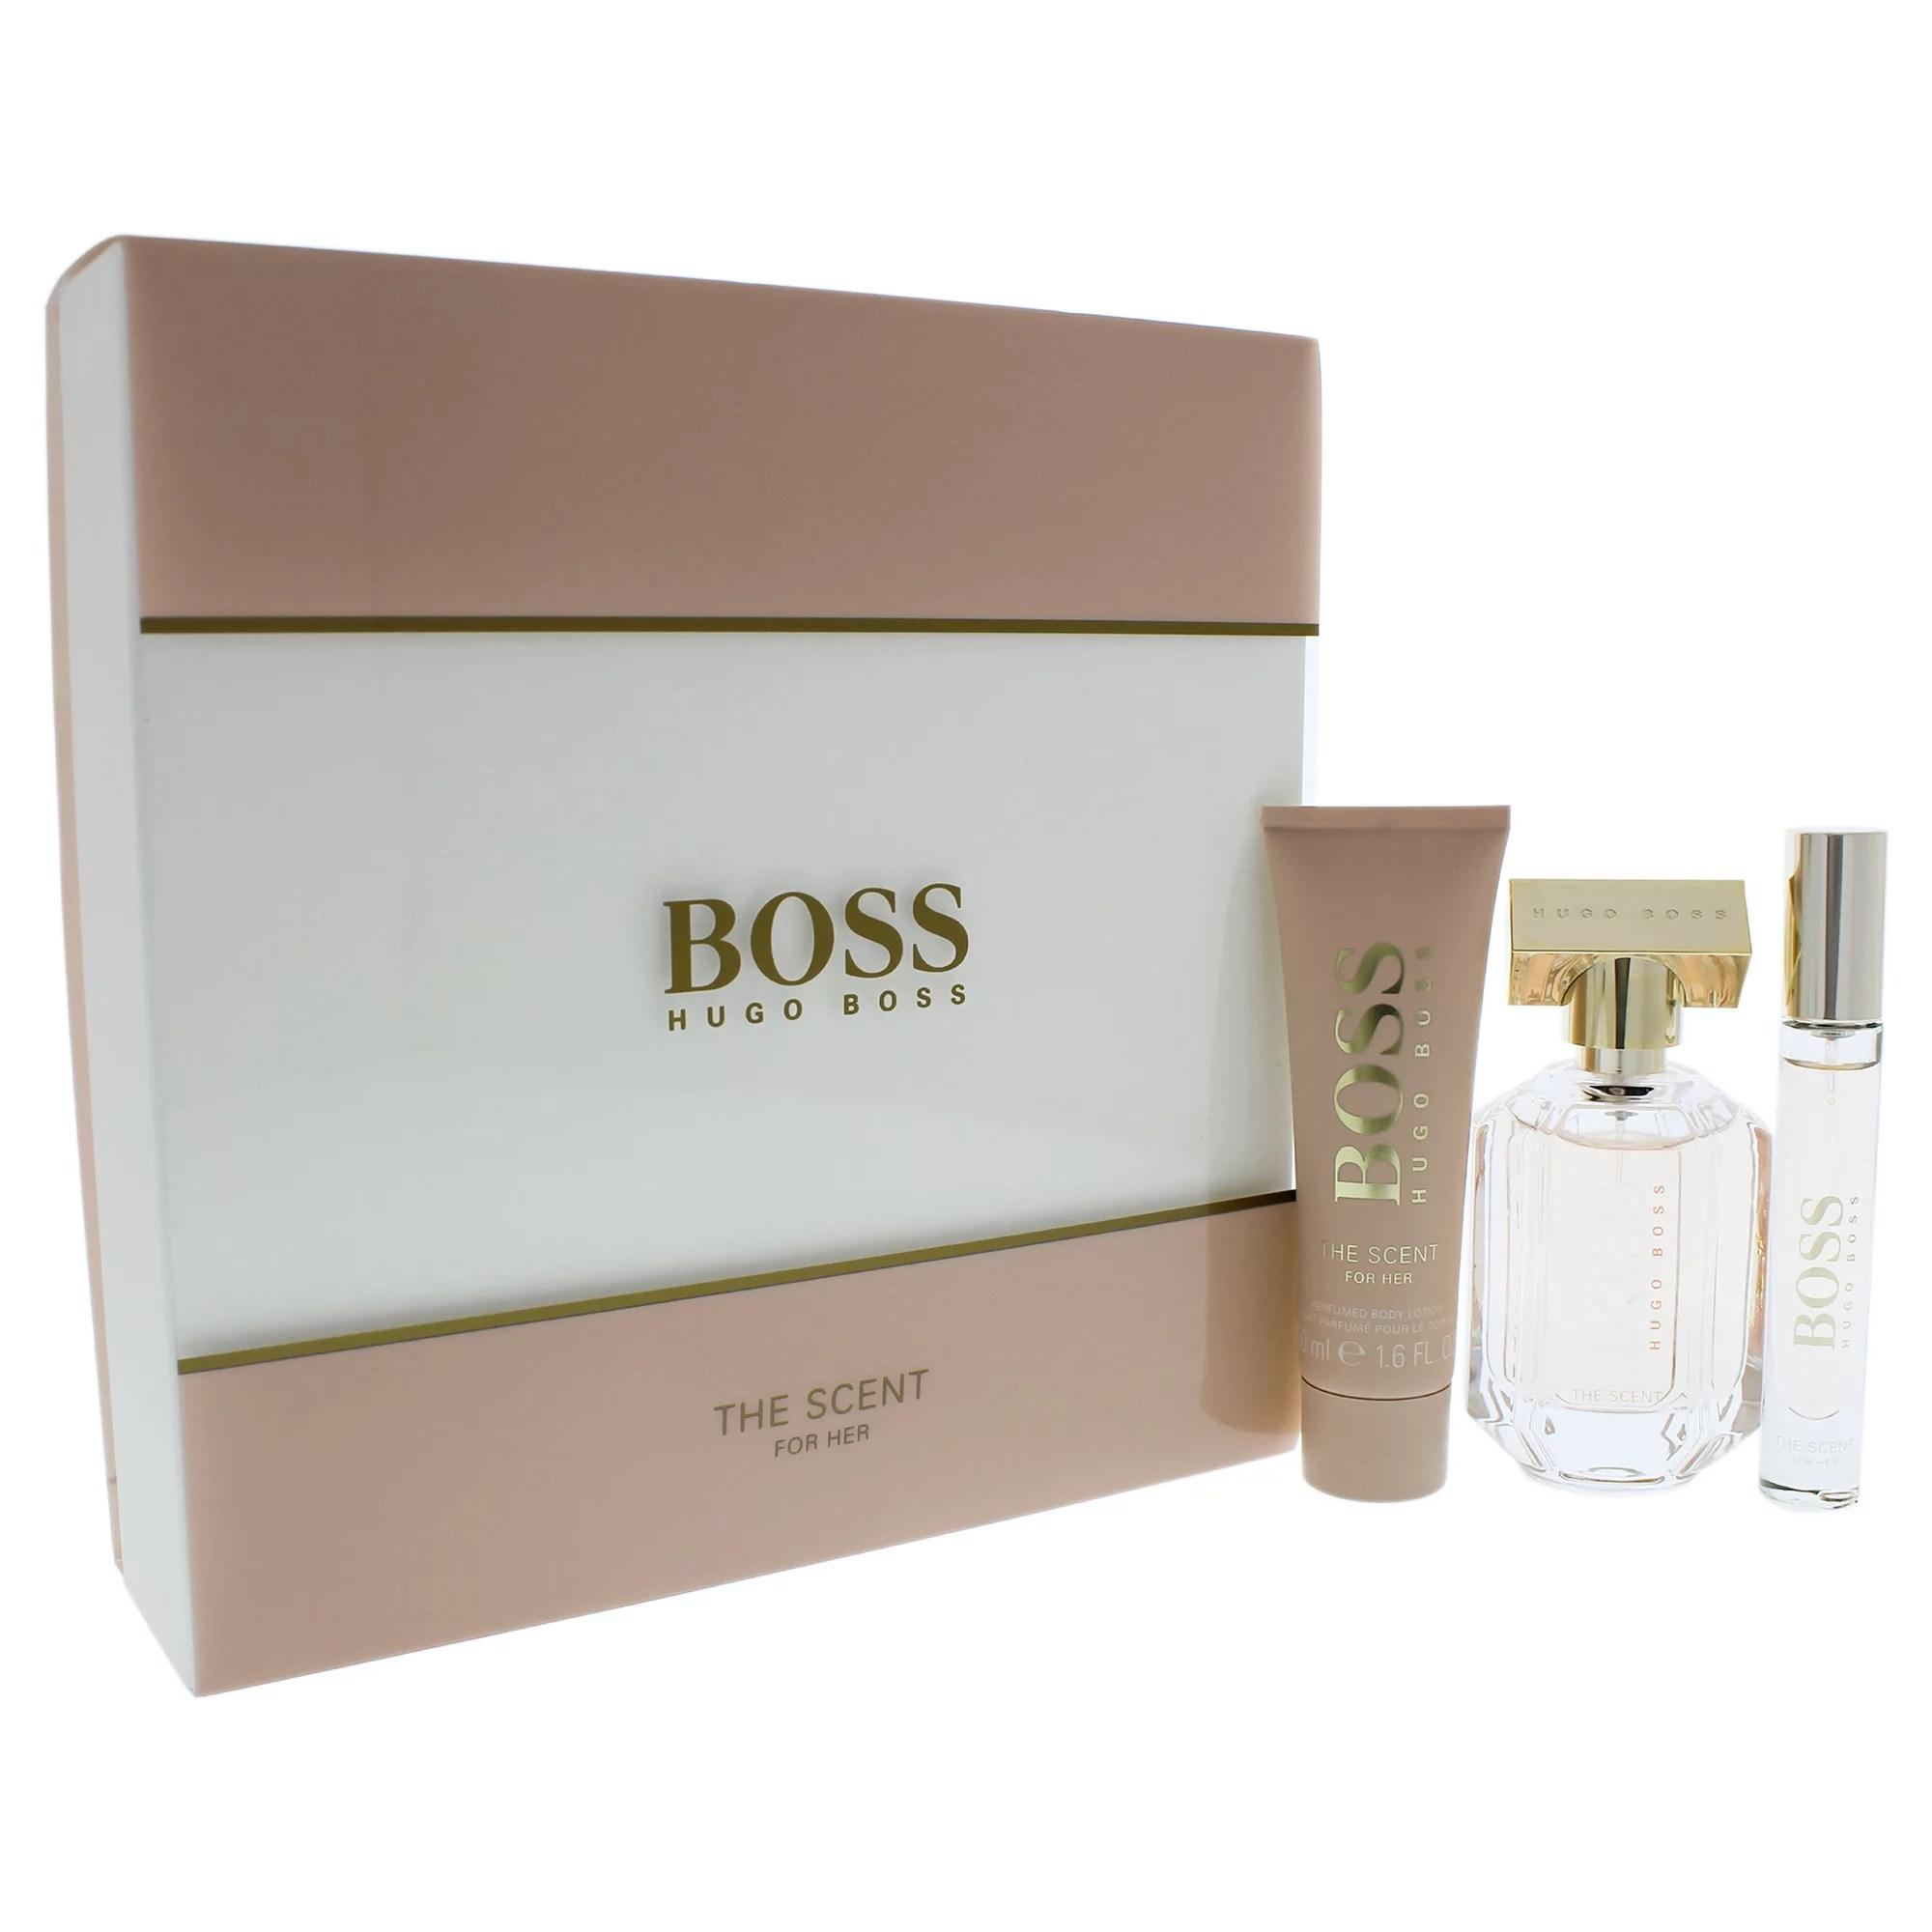 Boss The Scent By Hugo Boss For Women 3 Pc Gift Set 1